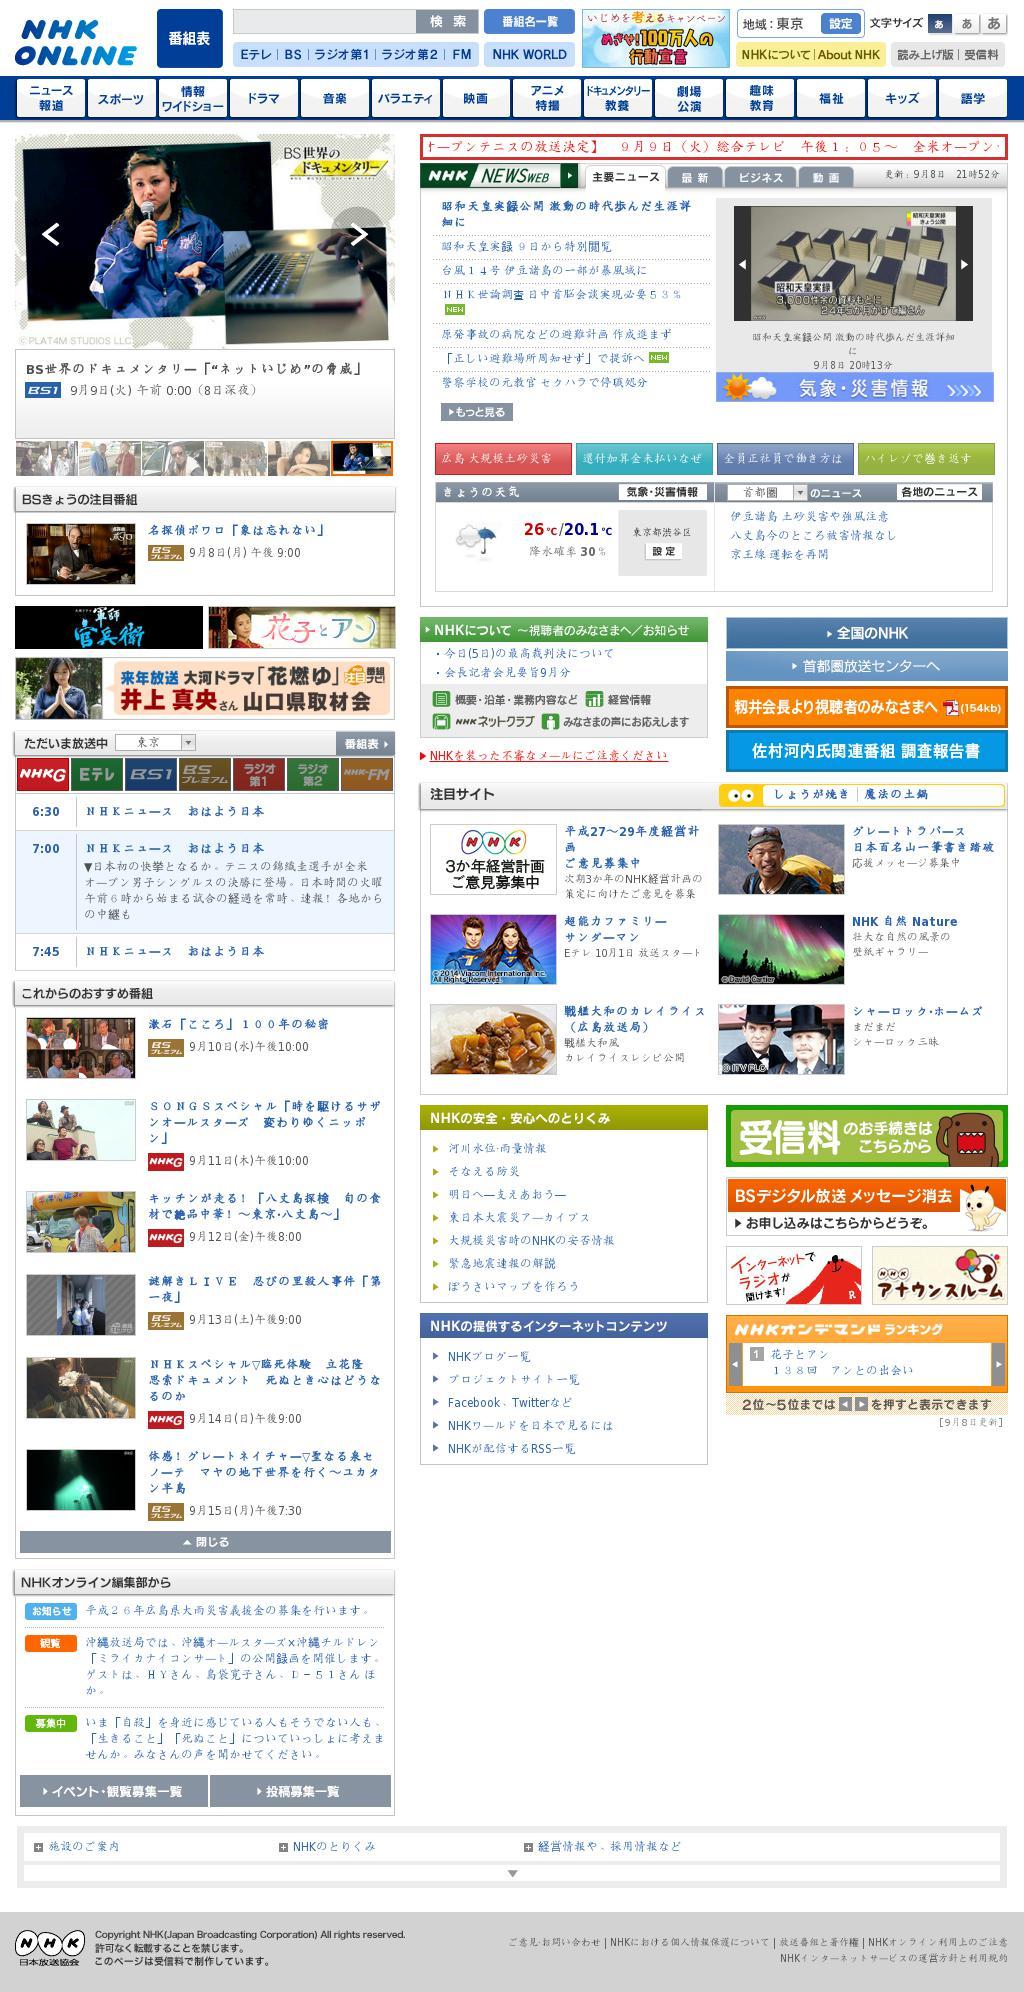 NHK Online at Monday Sept. 8, 2014, 10:18 p.m. UTC